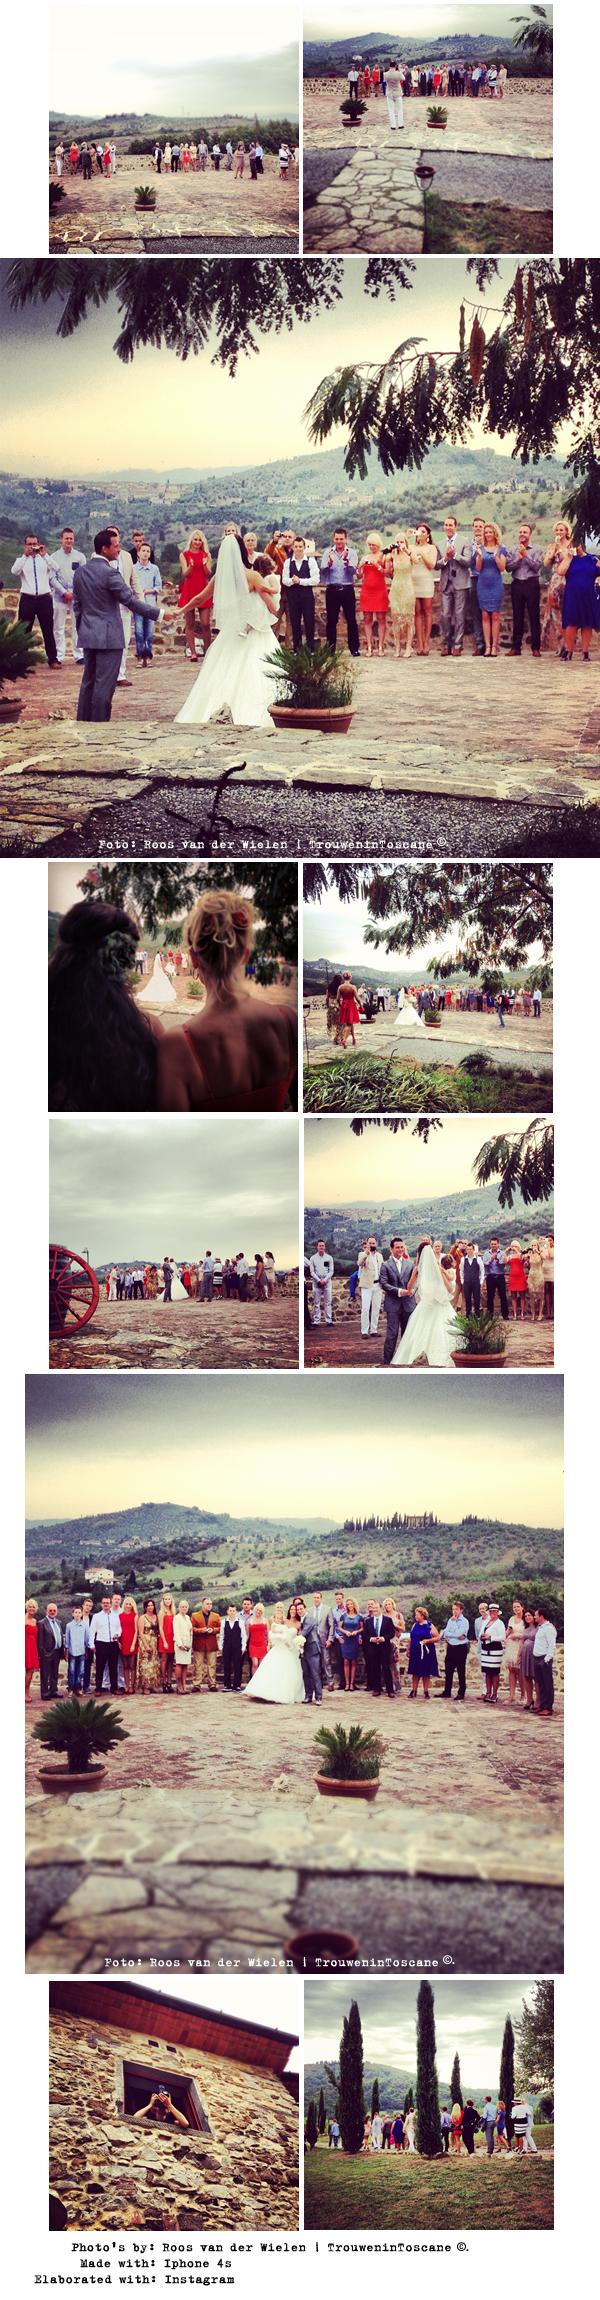 Instagram wedding by trouwen in toscane Roos van der Wielen